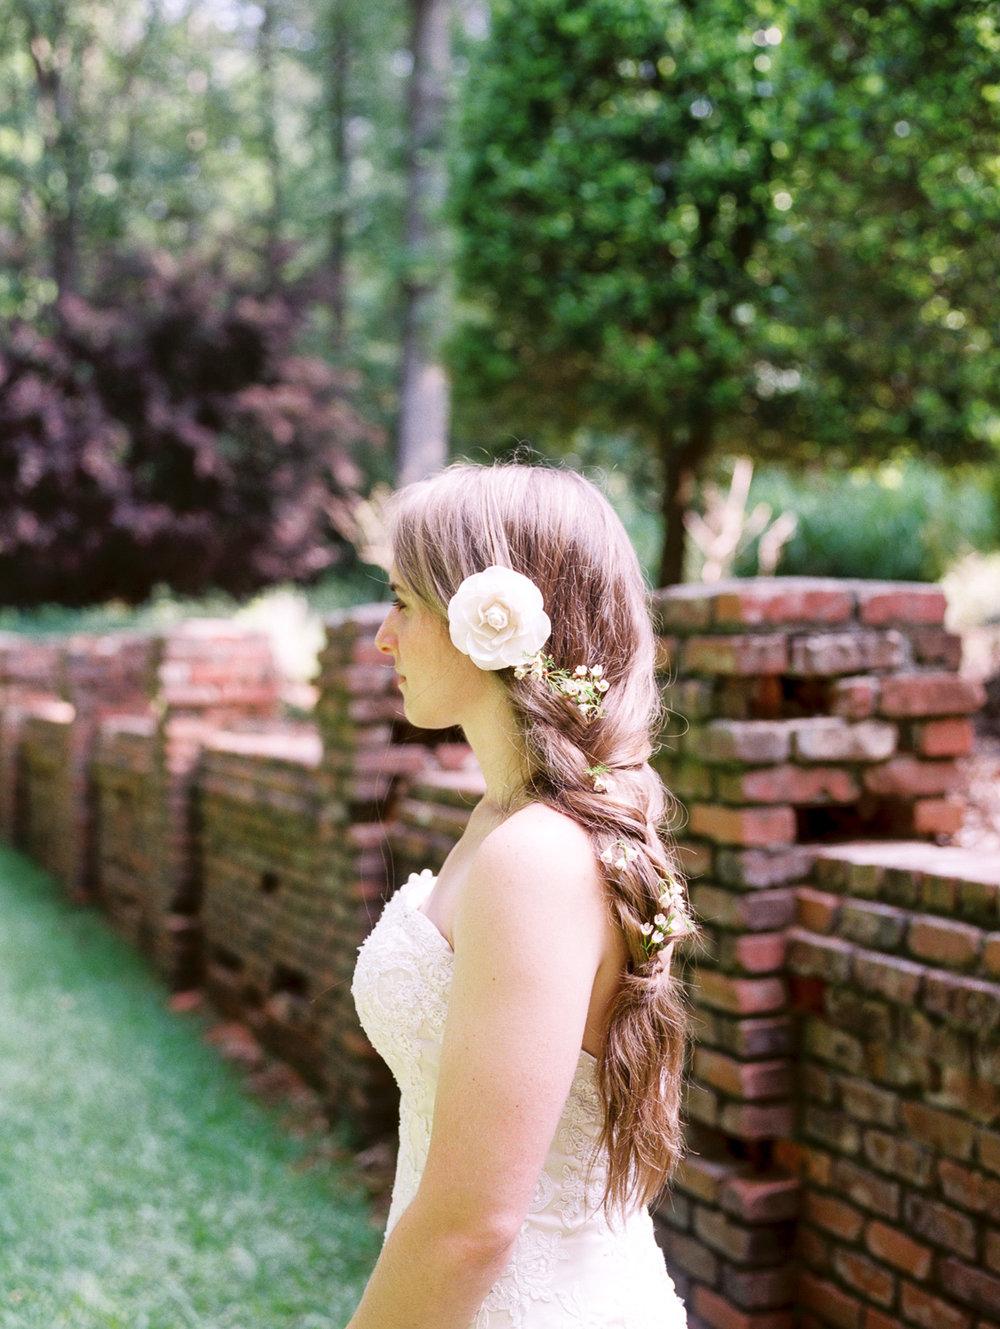 christinadavisphotography-romanticwedding-gardenweddinginspiration06.jpg